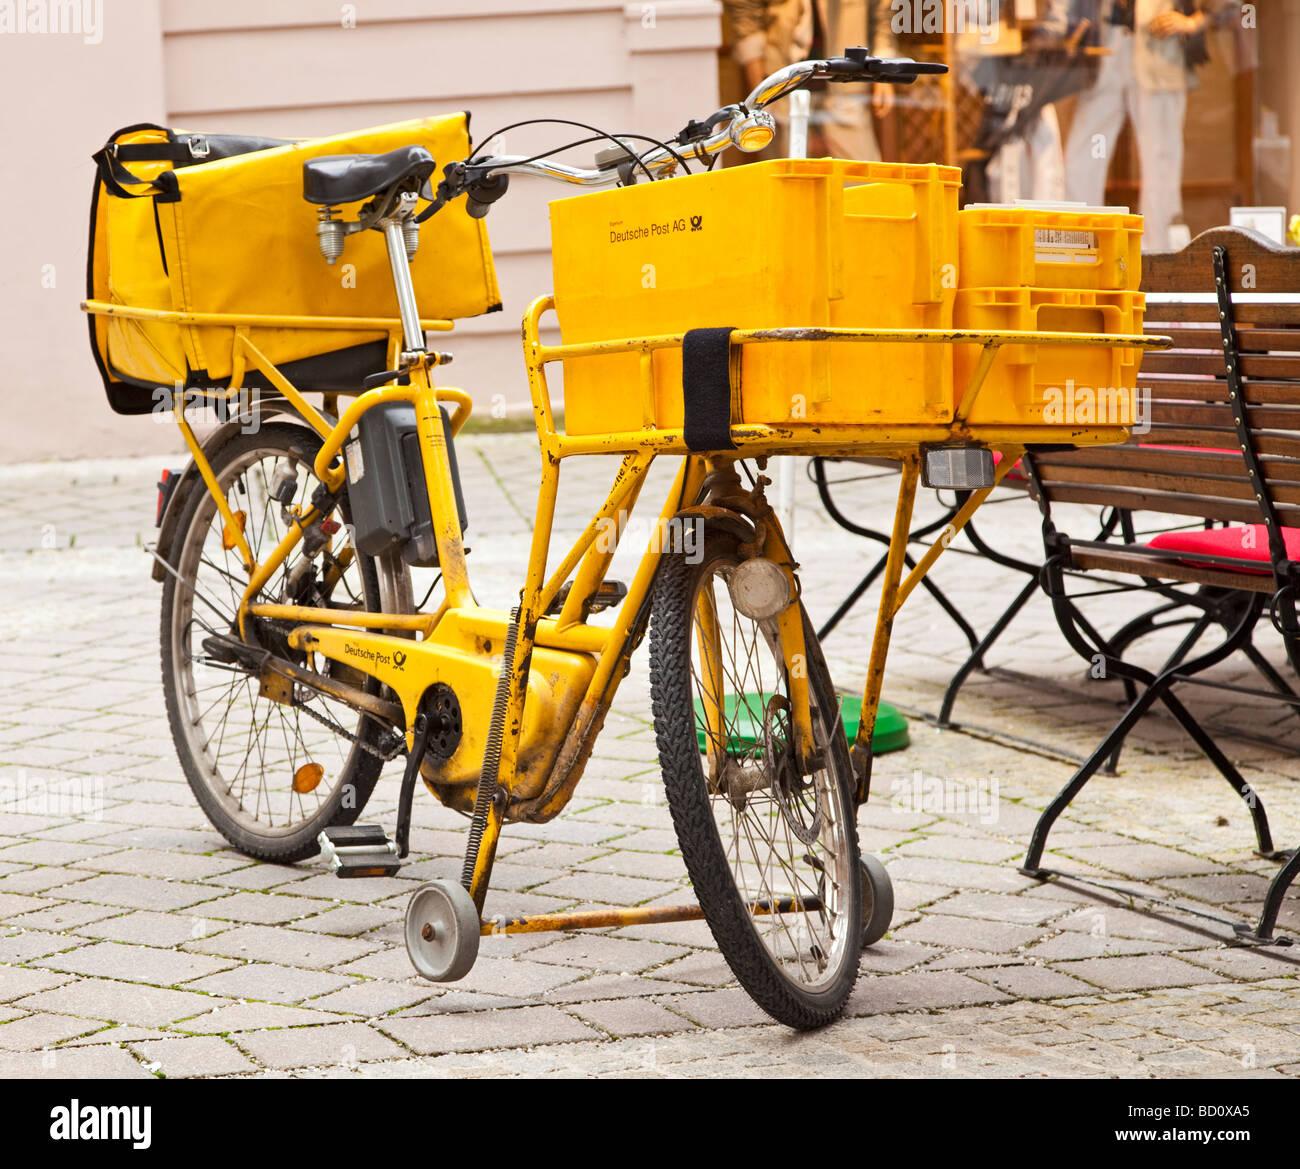 Postmans bicycle Deutsche Post, Germany, Europe - Stock Image